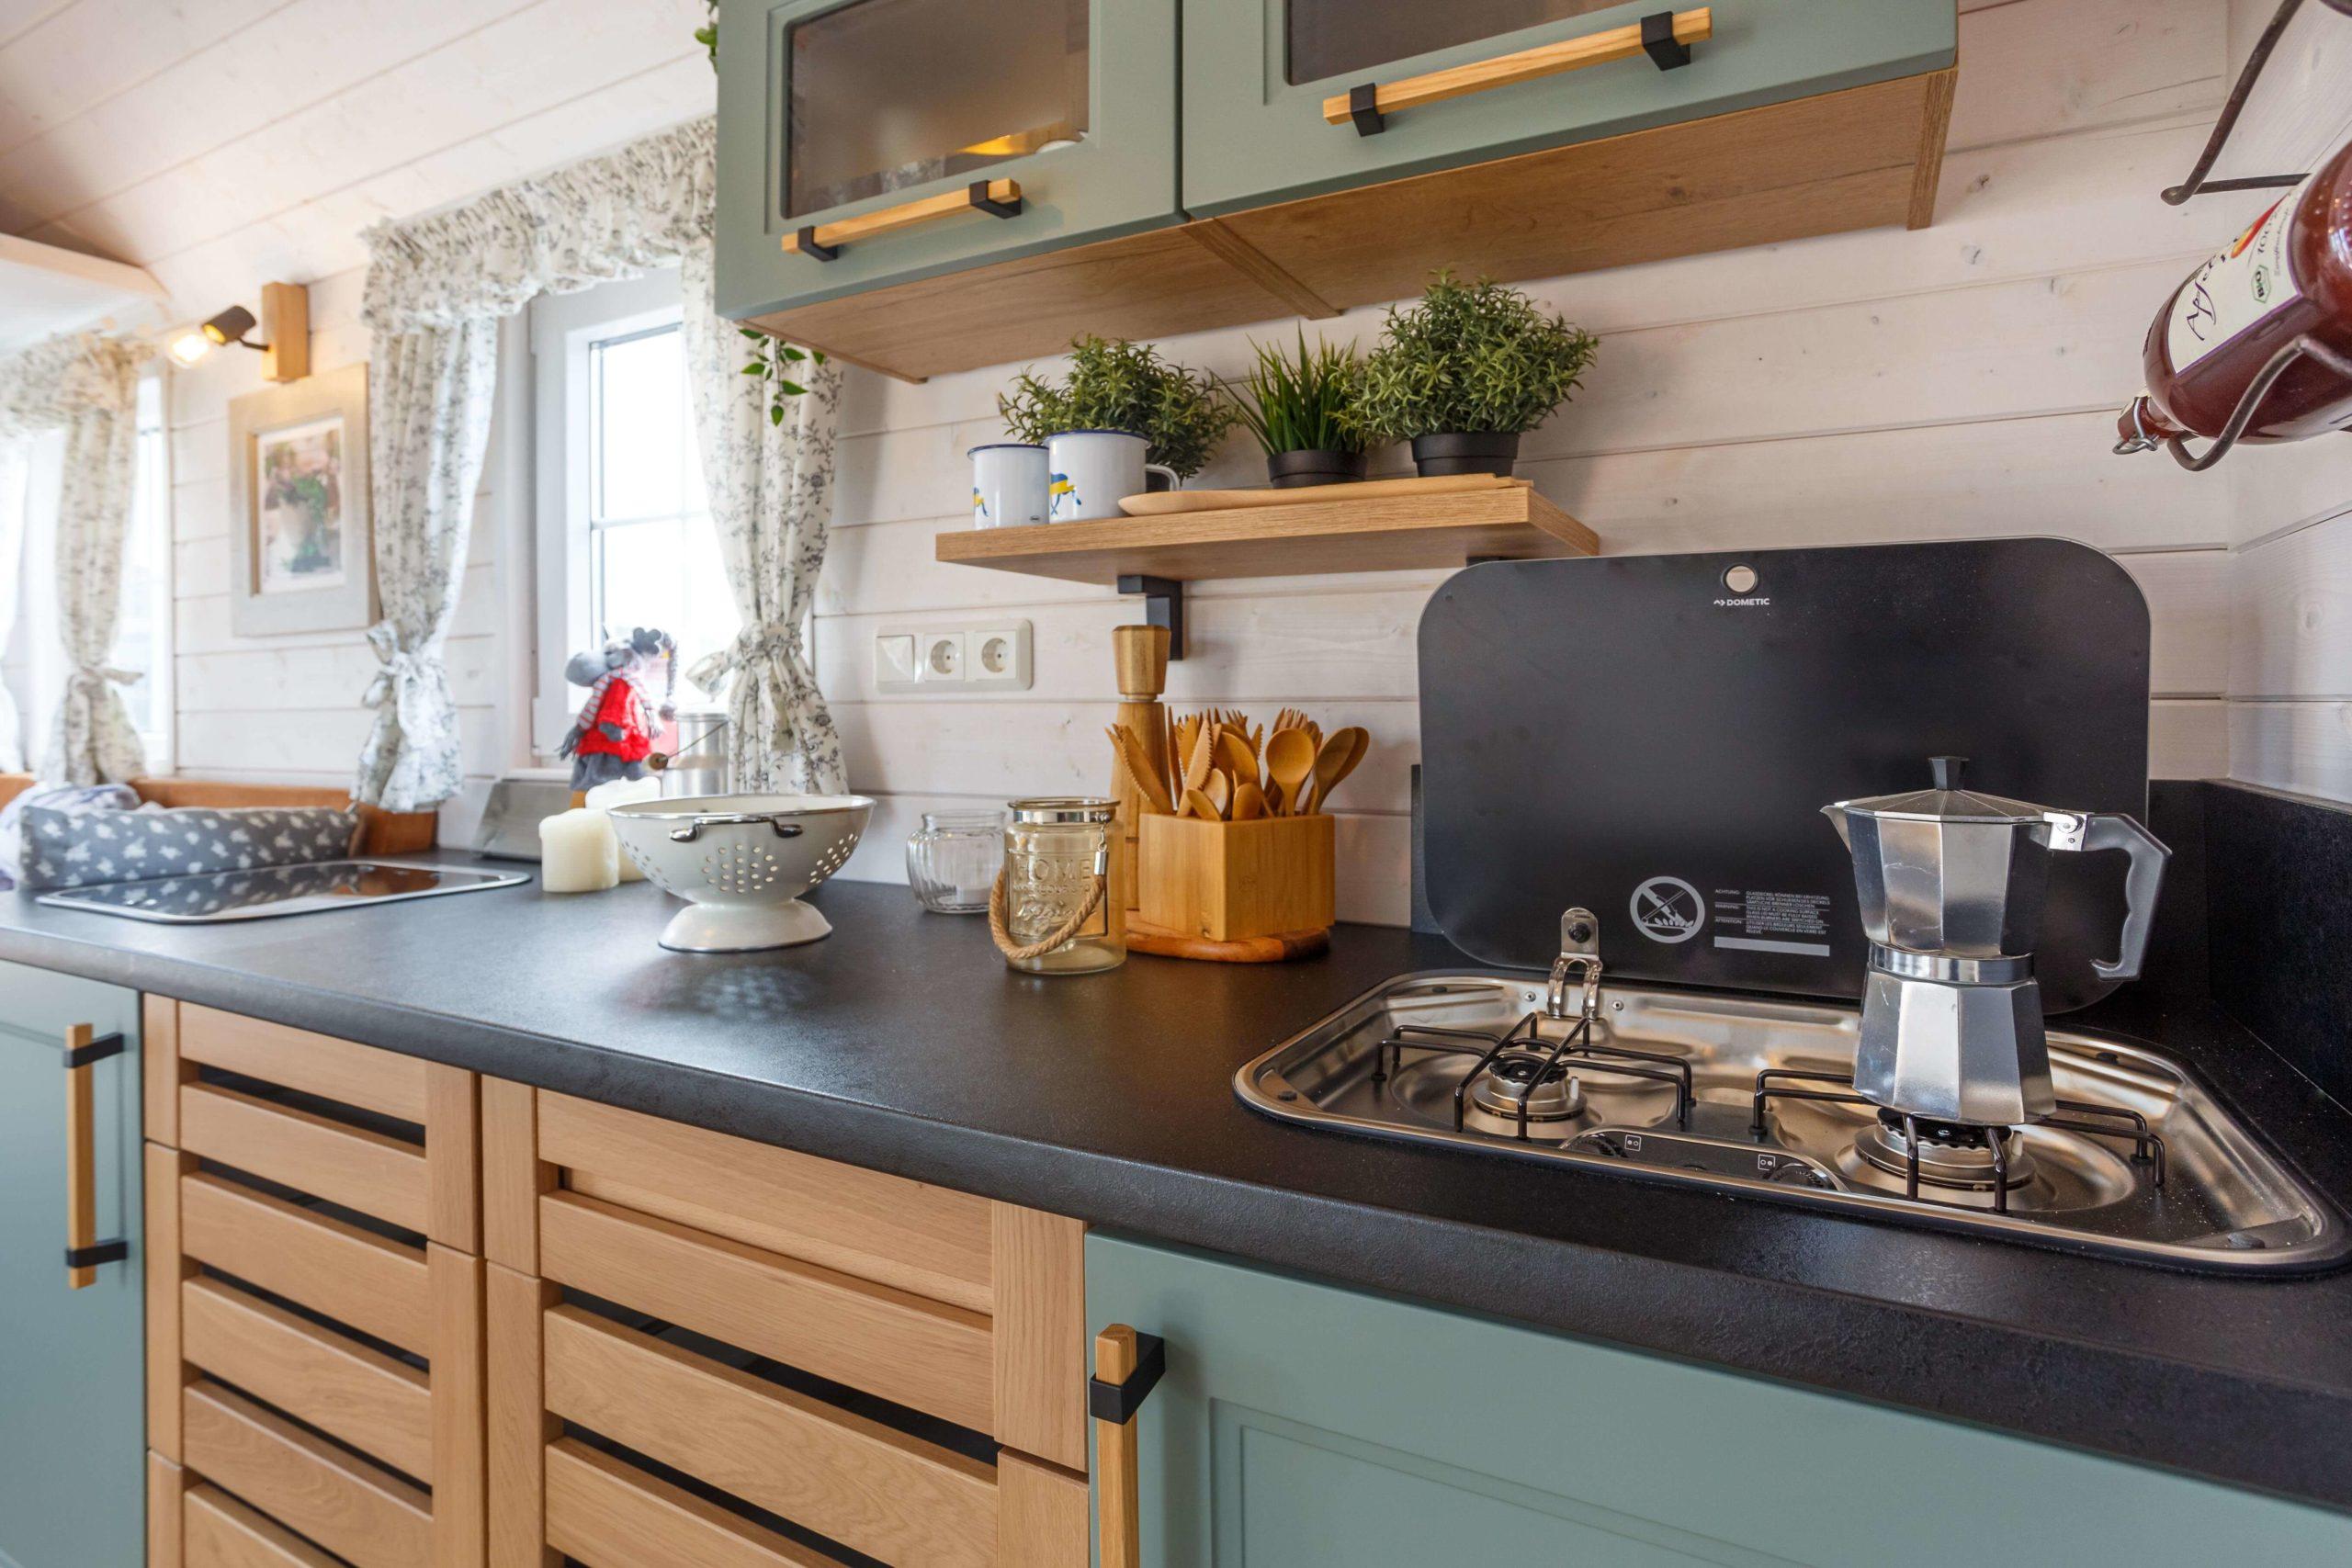 mobiles-tiny-house-schweden-vital-camp-gmbh-22